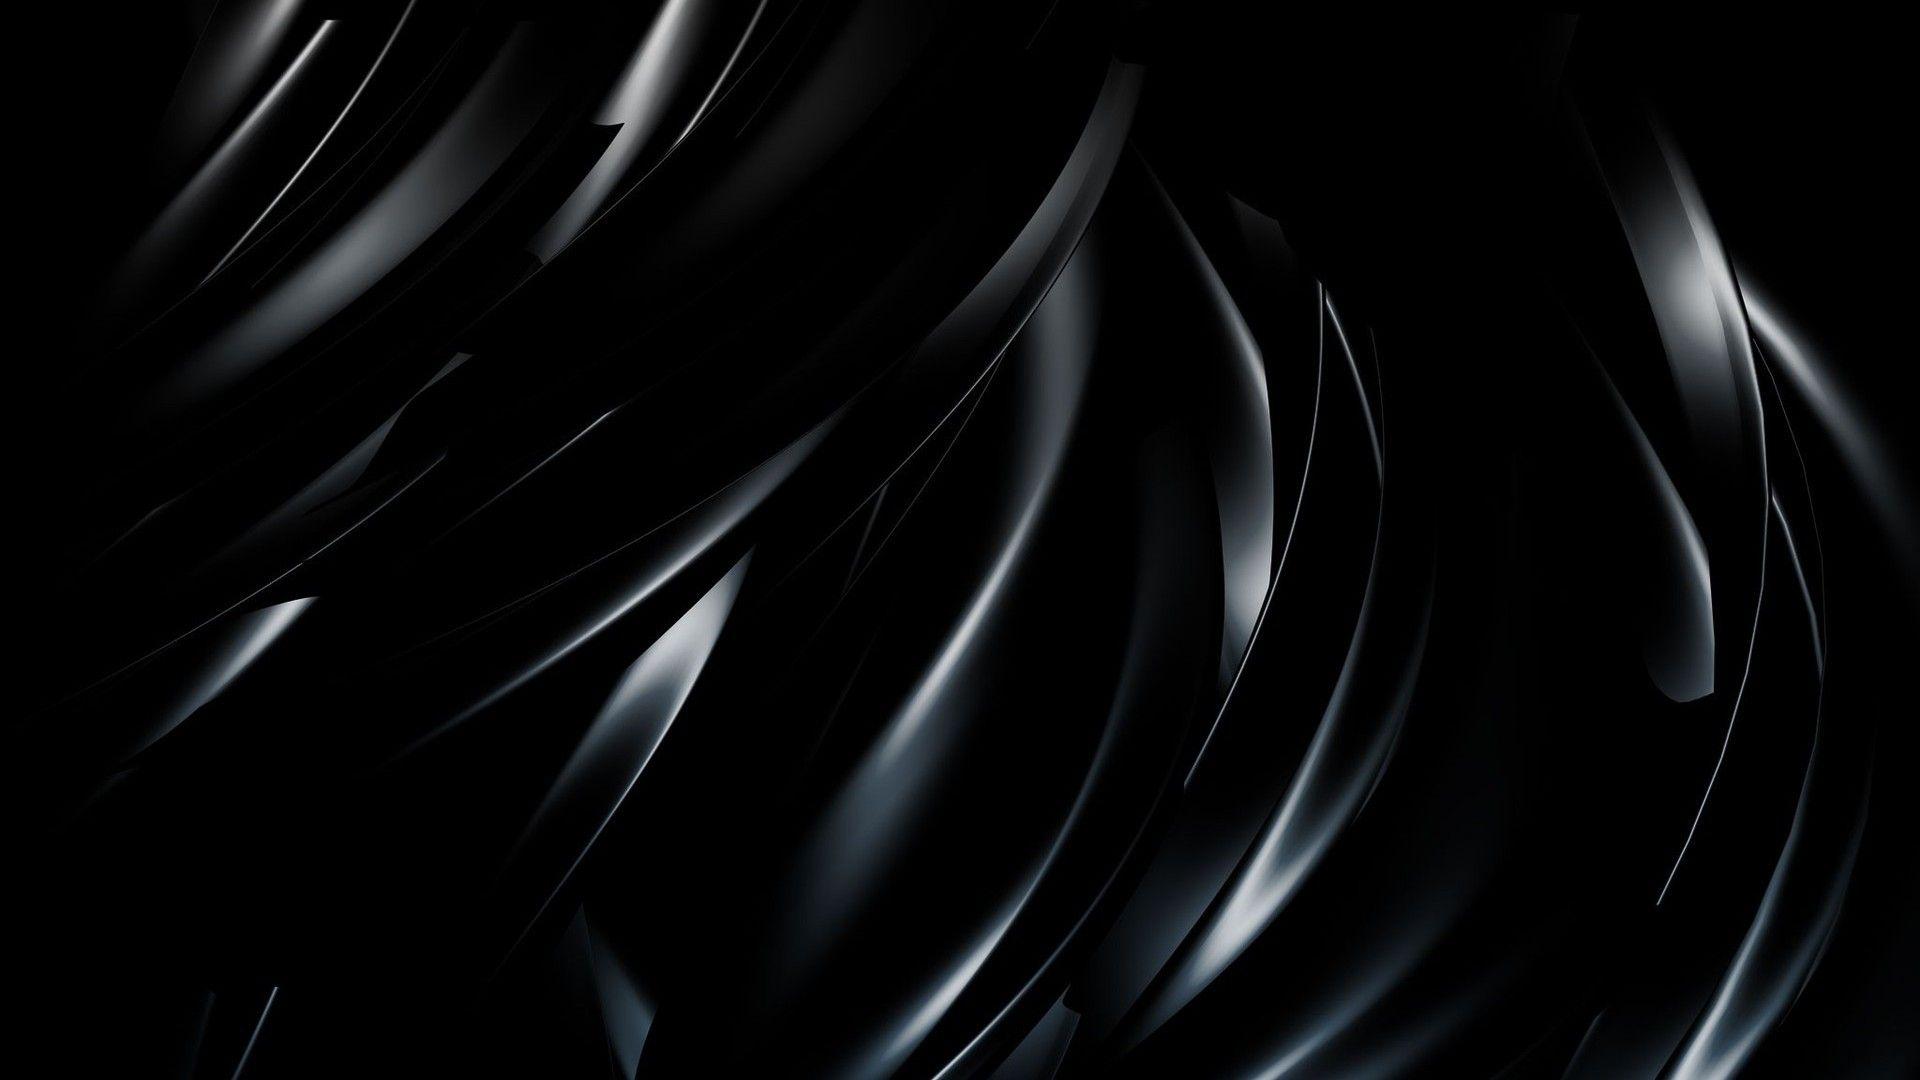 Dark Wallpaper 19202151080 1920x1080